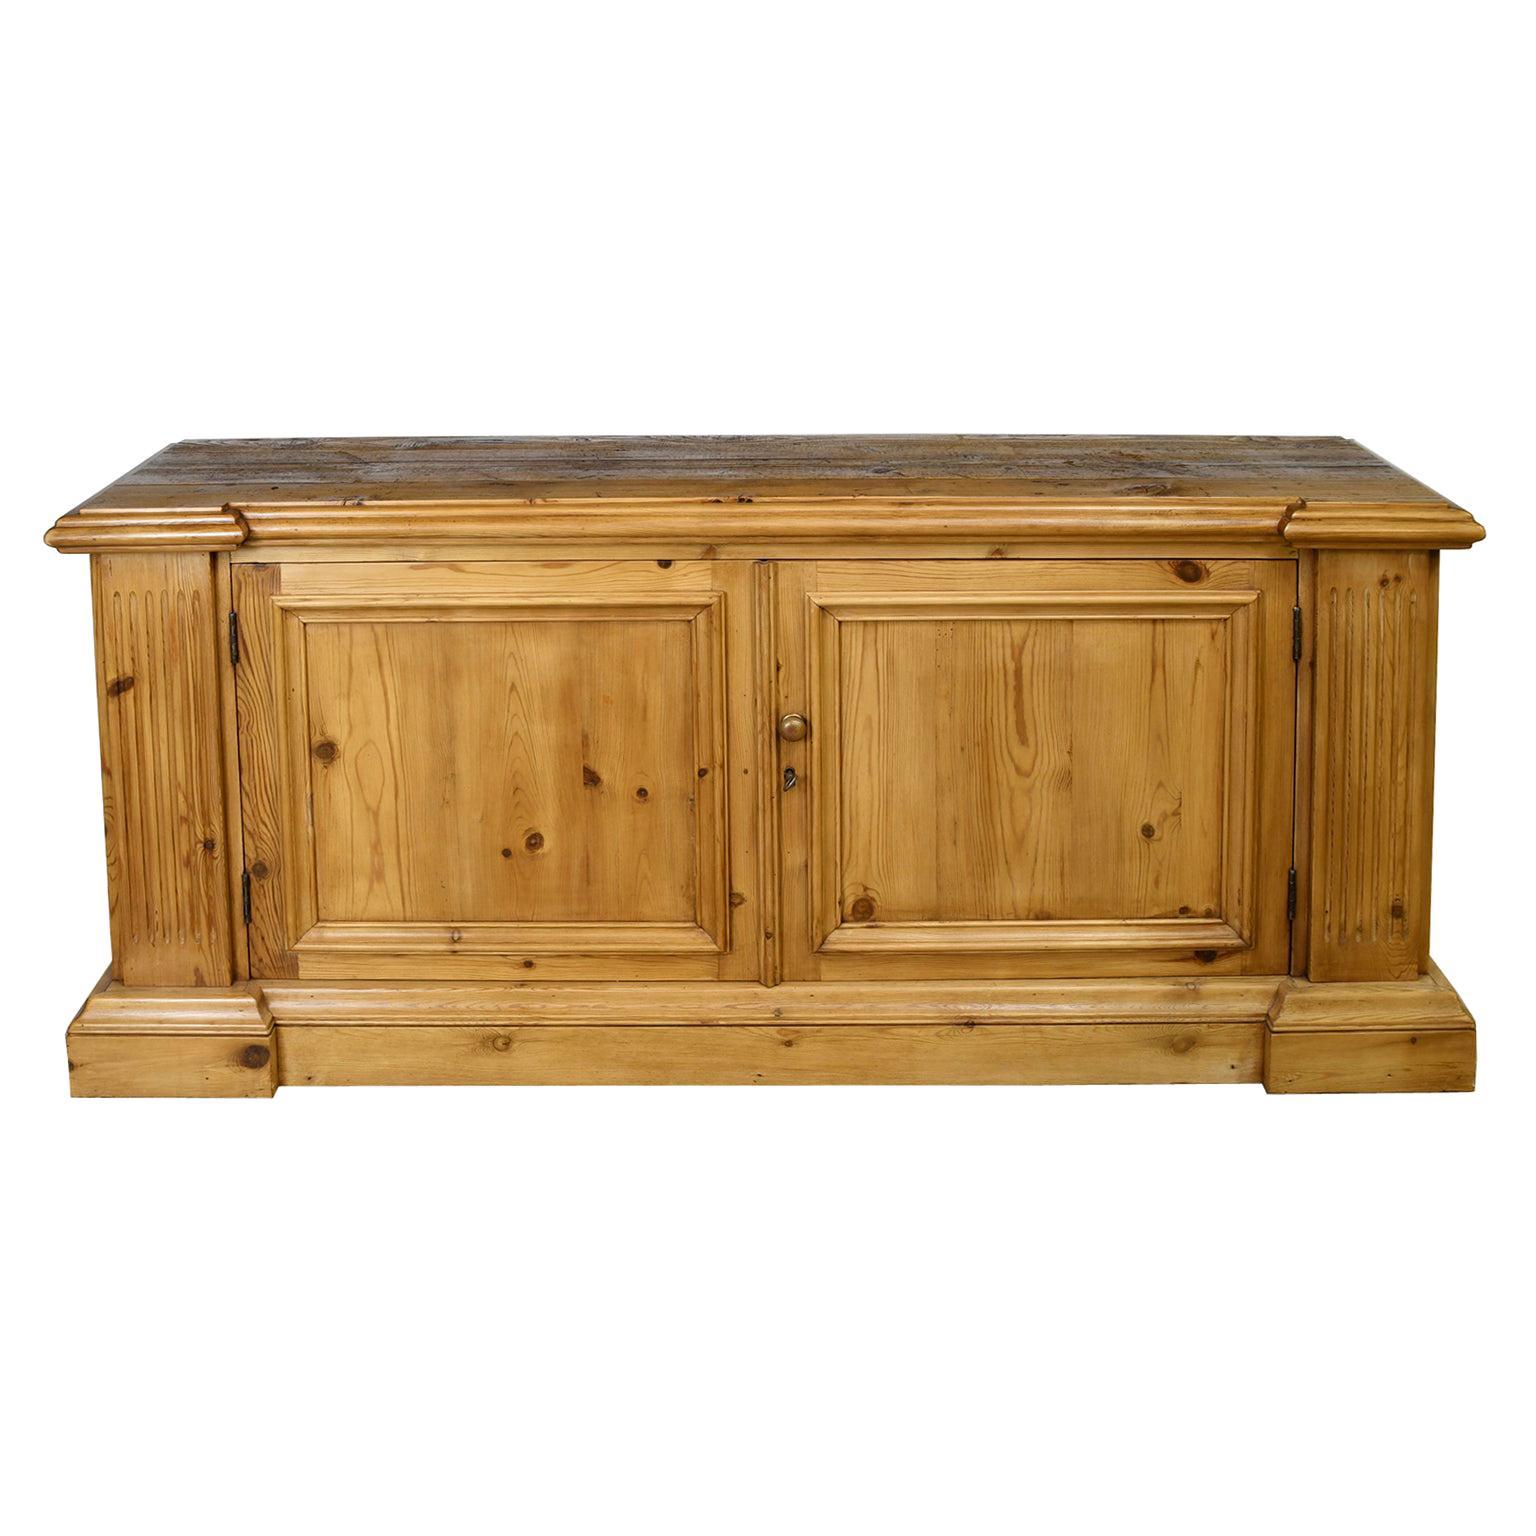 Bonnin Ashley Custom Made Sideboard Cabinet in Repurposed European Pine